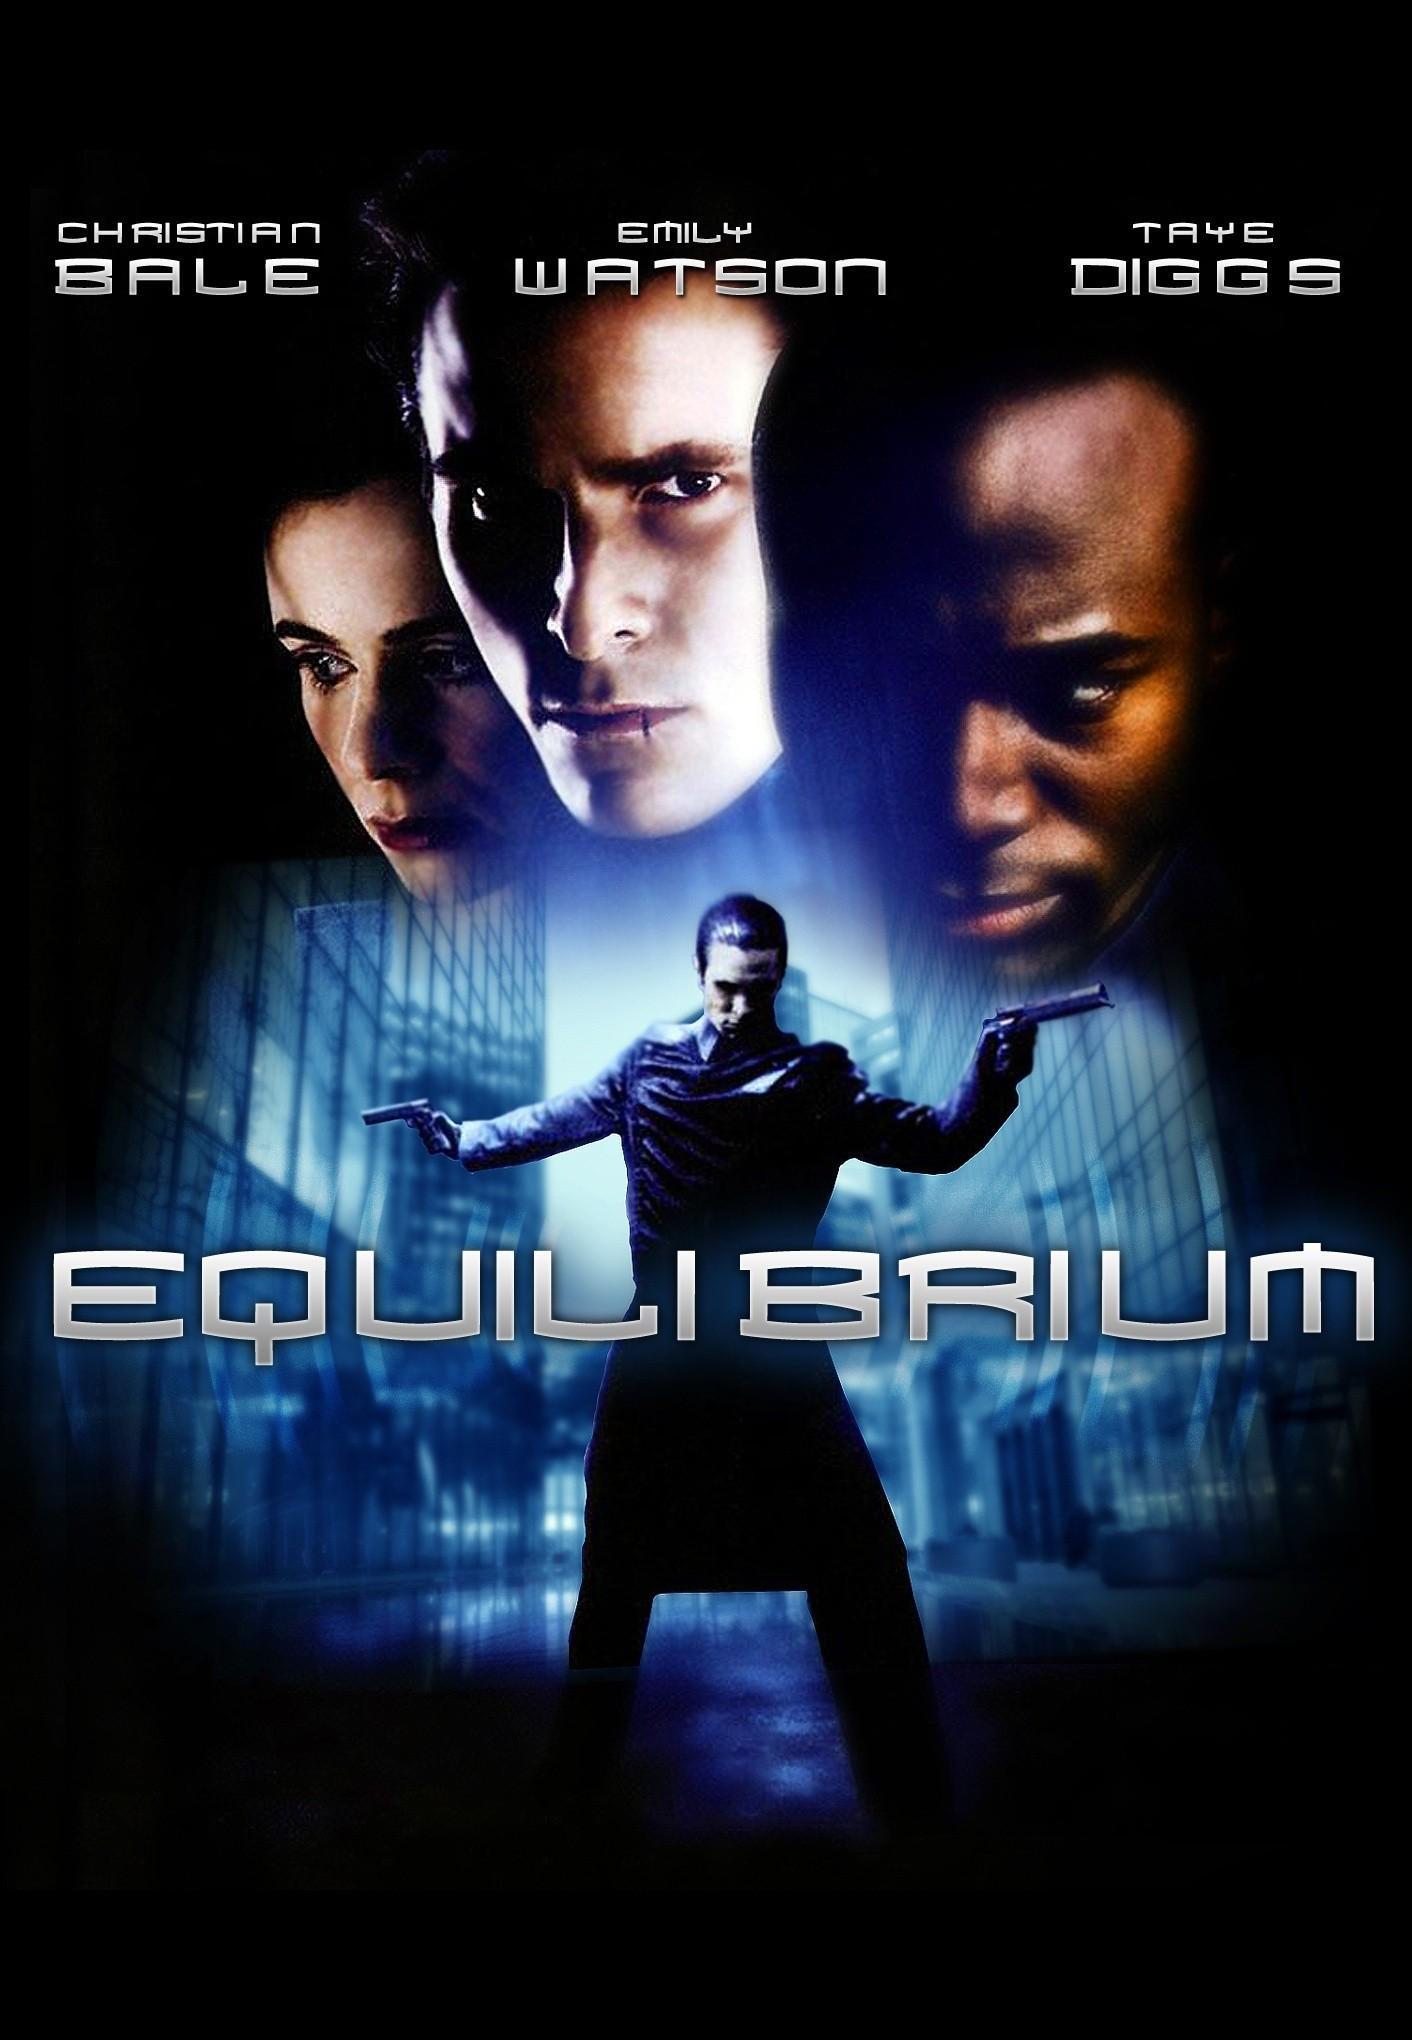 Equilibrium - Kurt Wimmer | eMaginarock